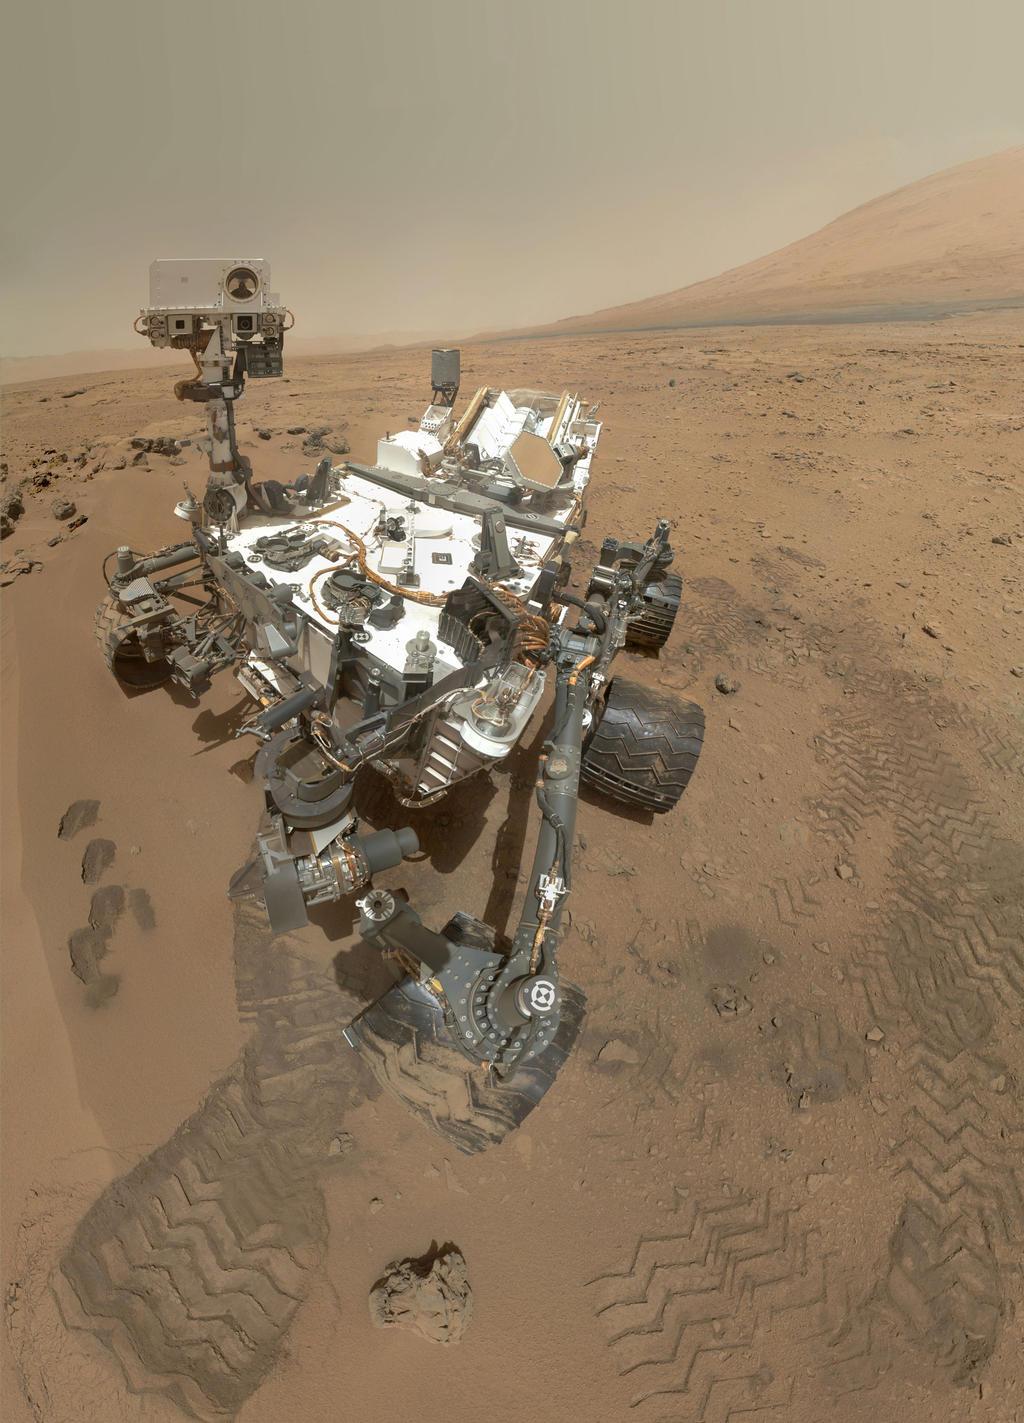 Curiosity rover takes high-resolution self-portrait on Mars